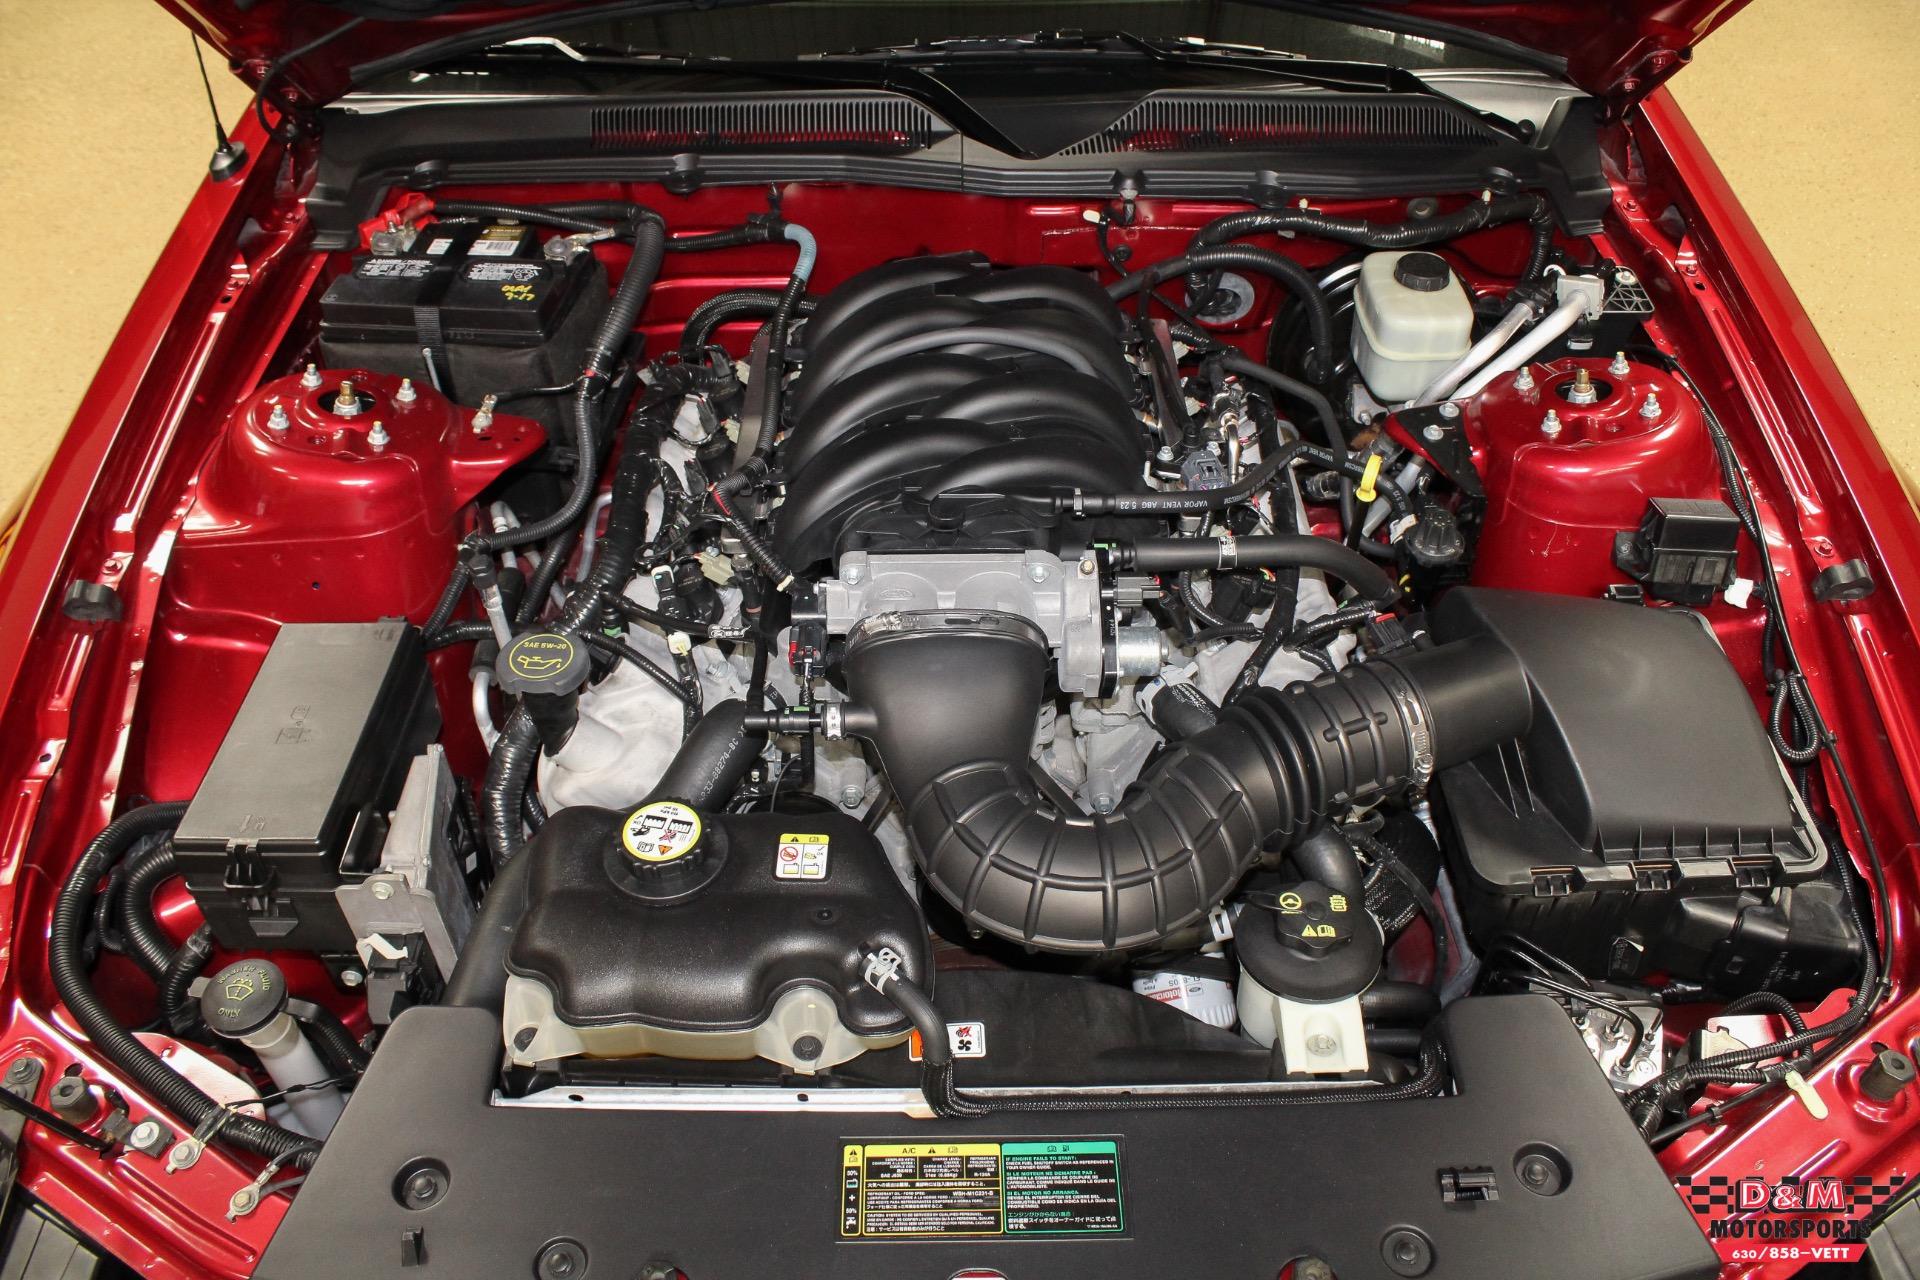 Used 2006 Ford Mustang GT Roush | Glen Ellyn, IL